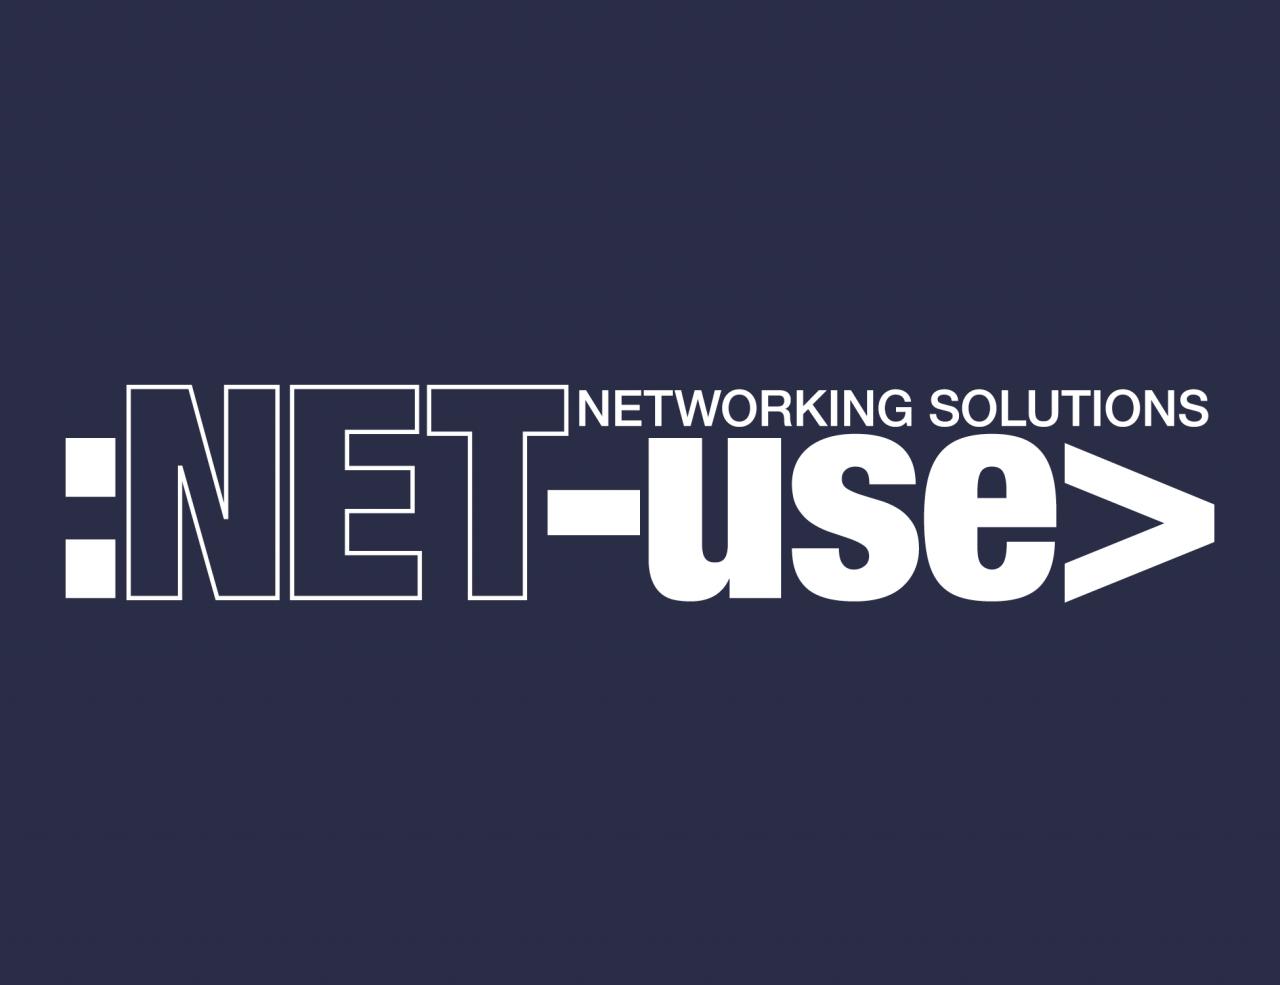 Net-use